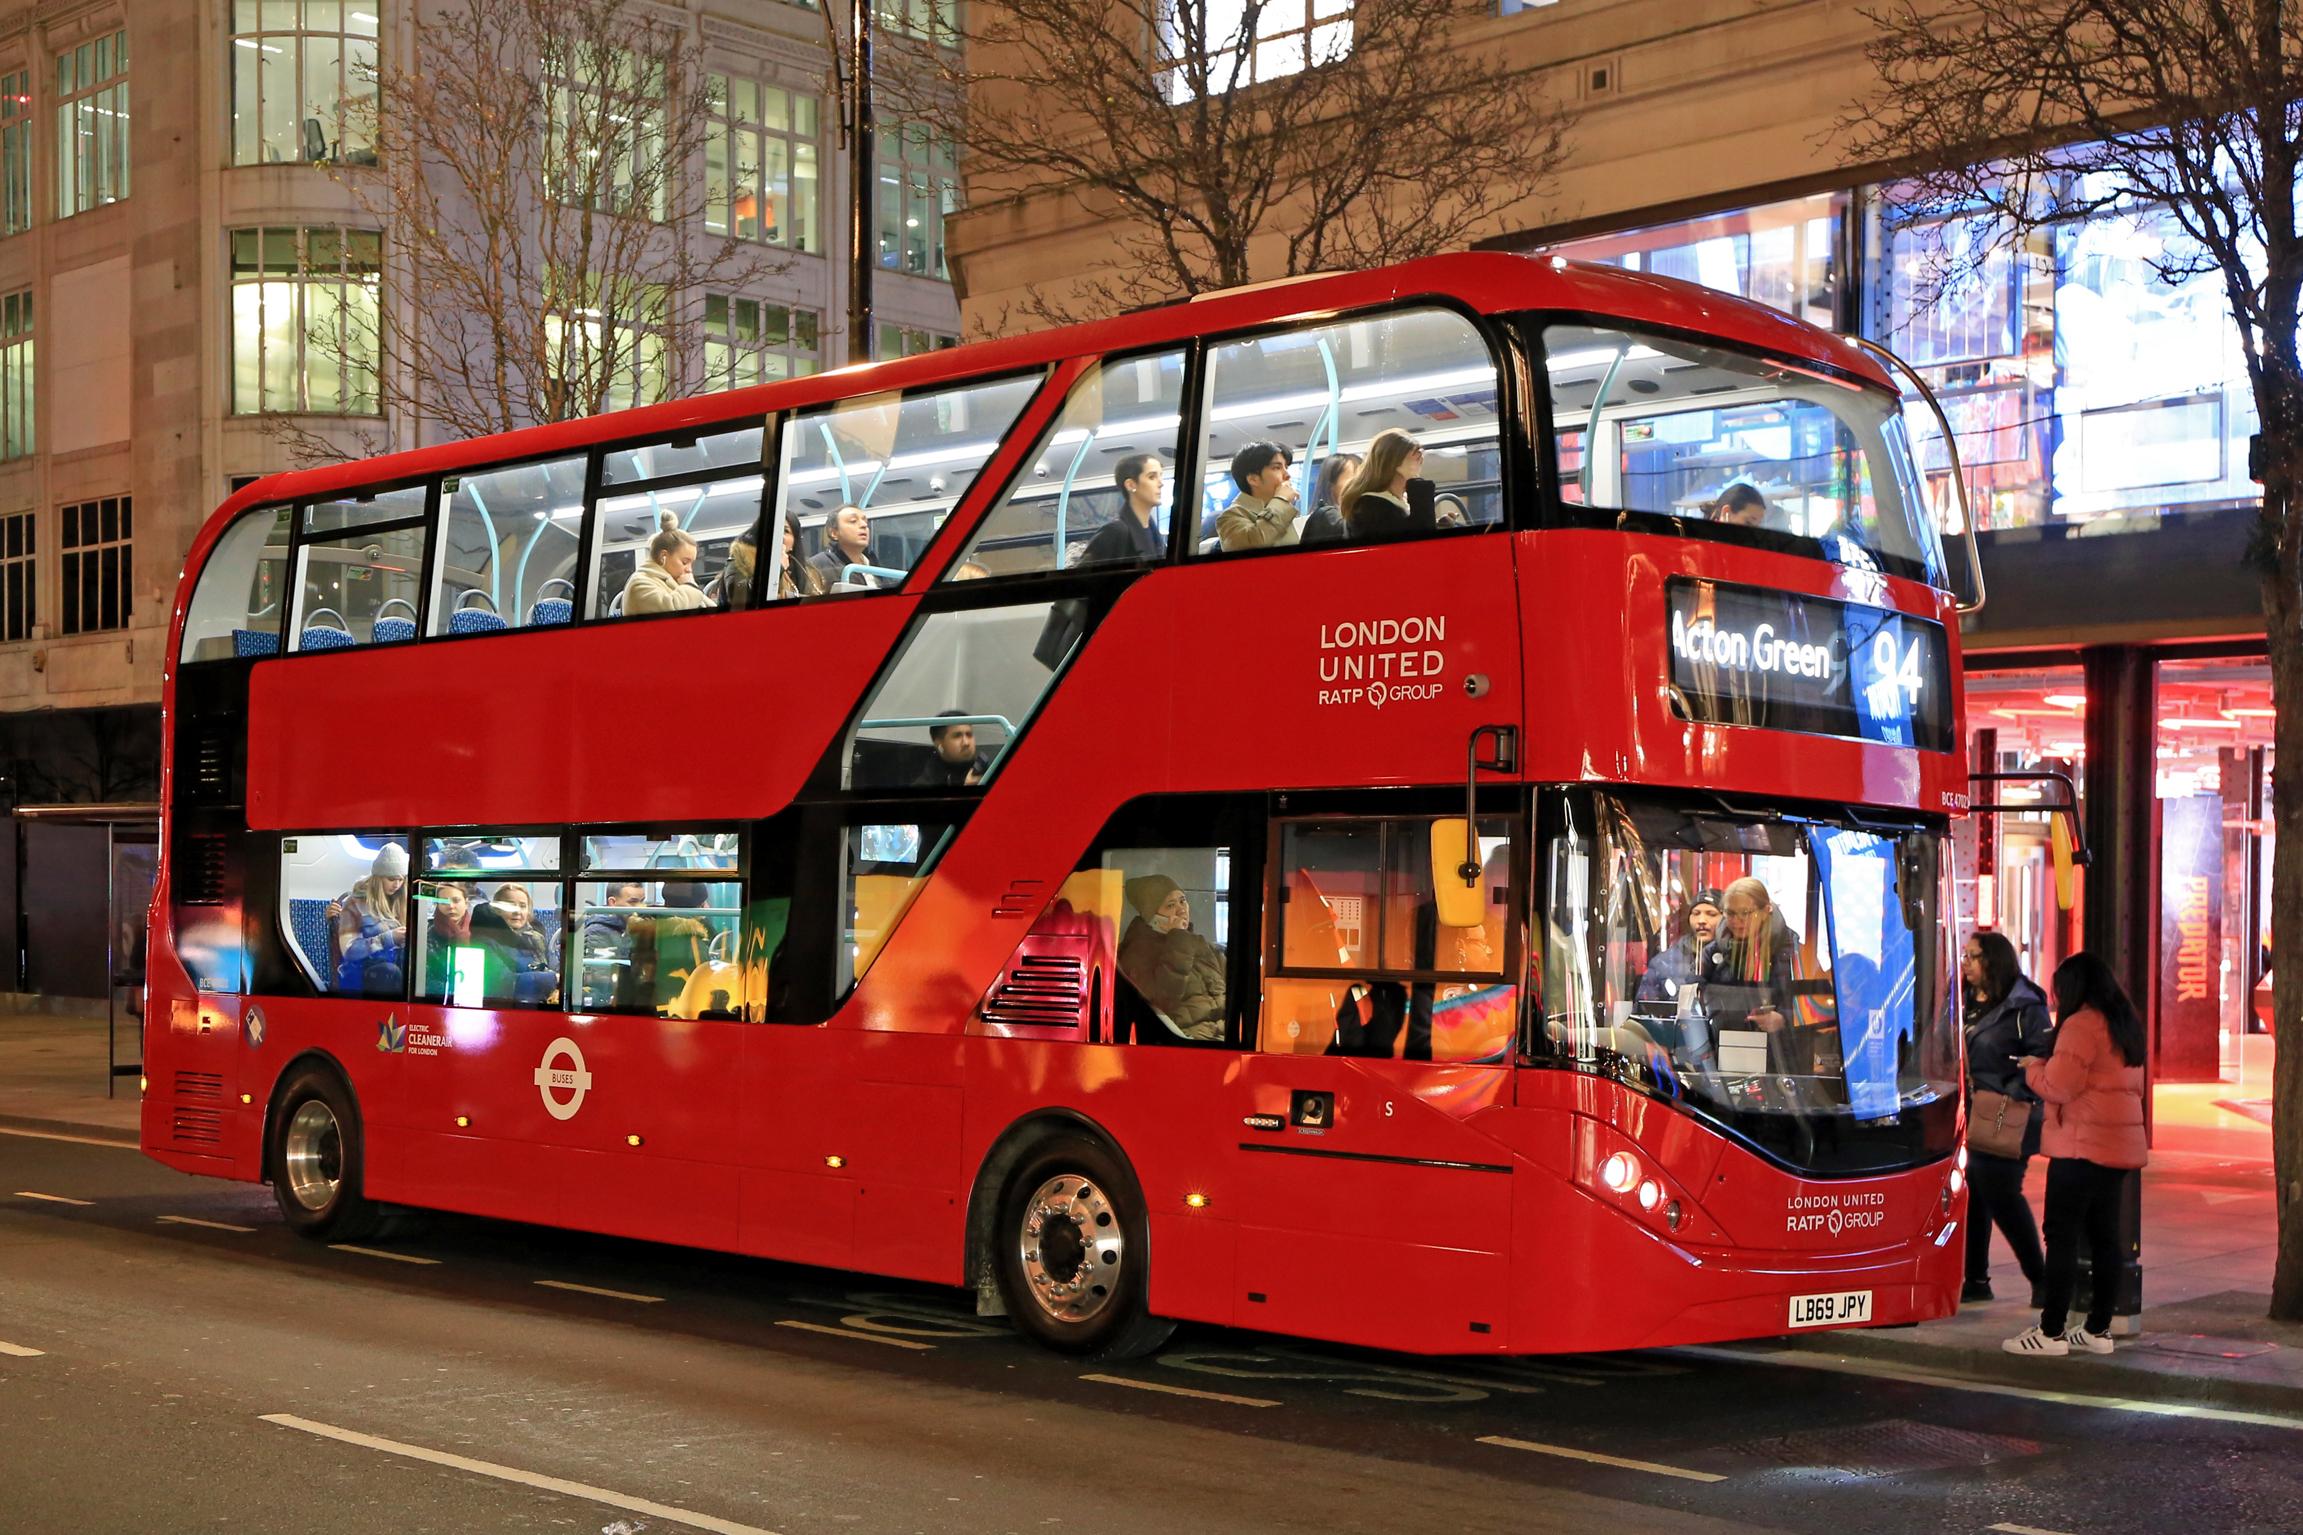 London drivers need vaccine priority, says Unite